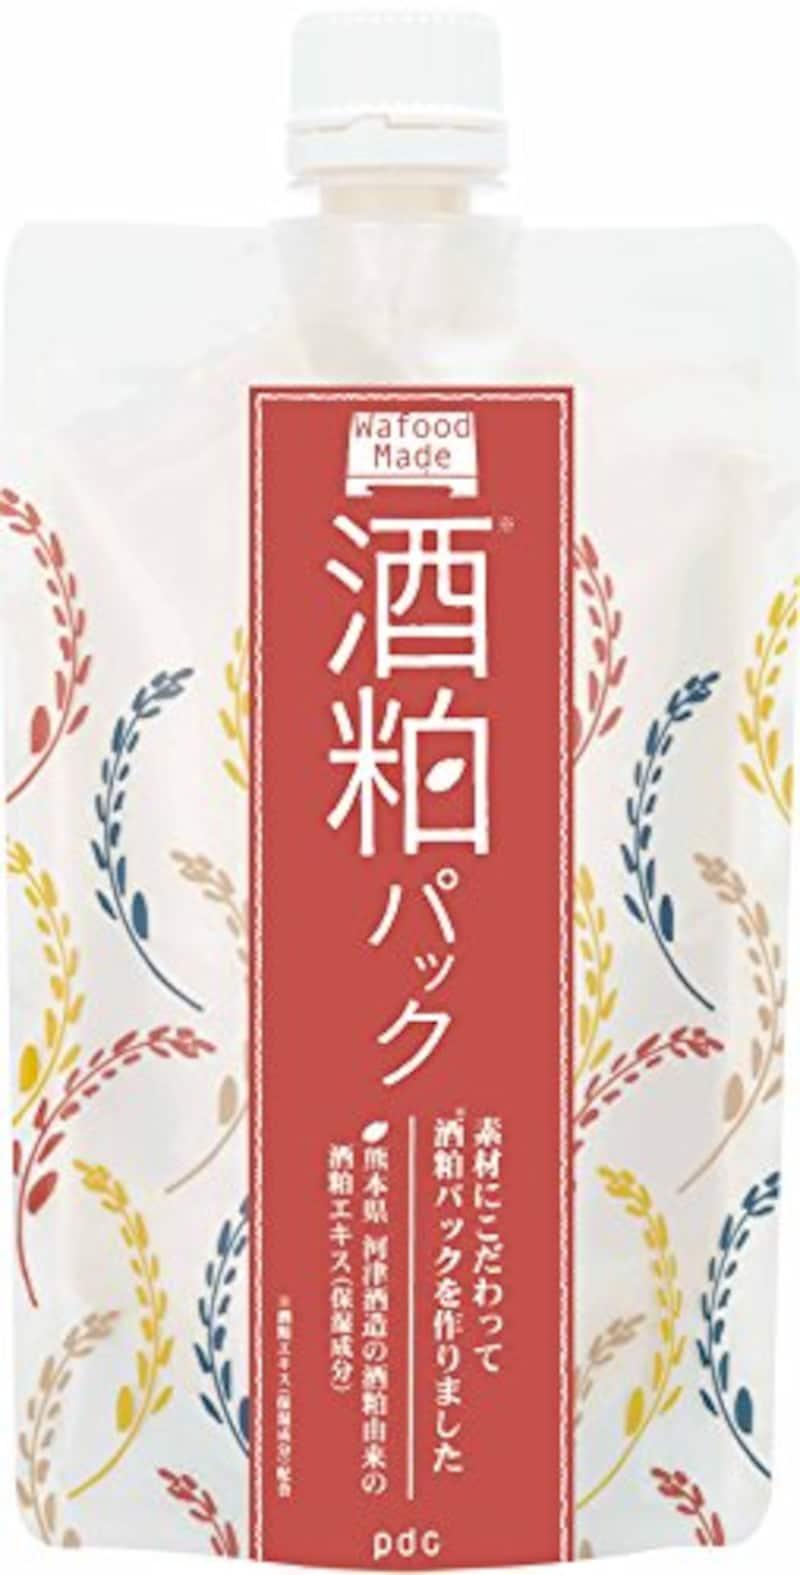 pdc,ワフードメイド(Wafood Made) 酒粕パック